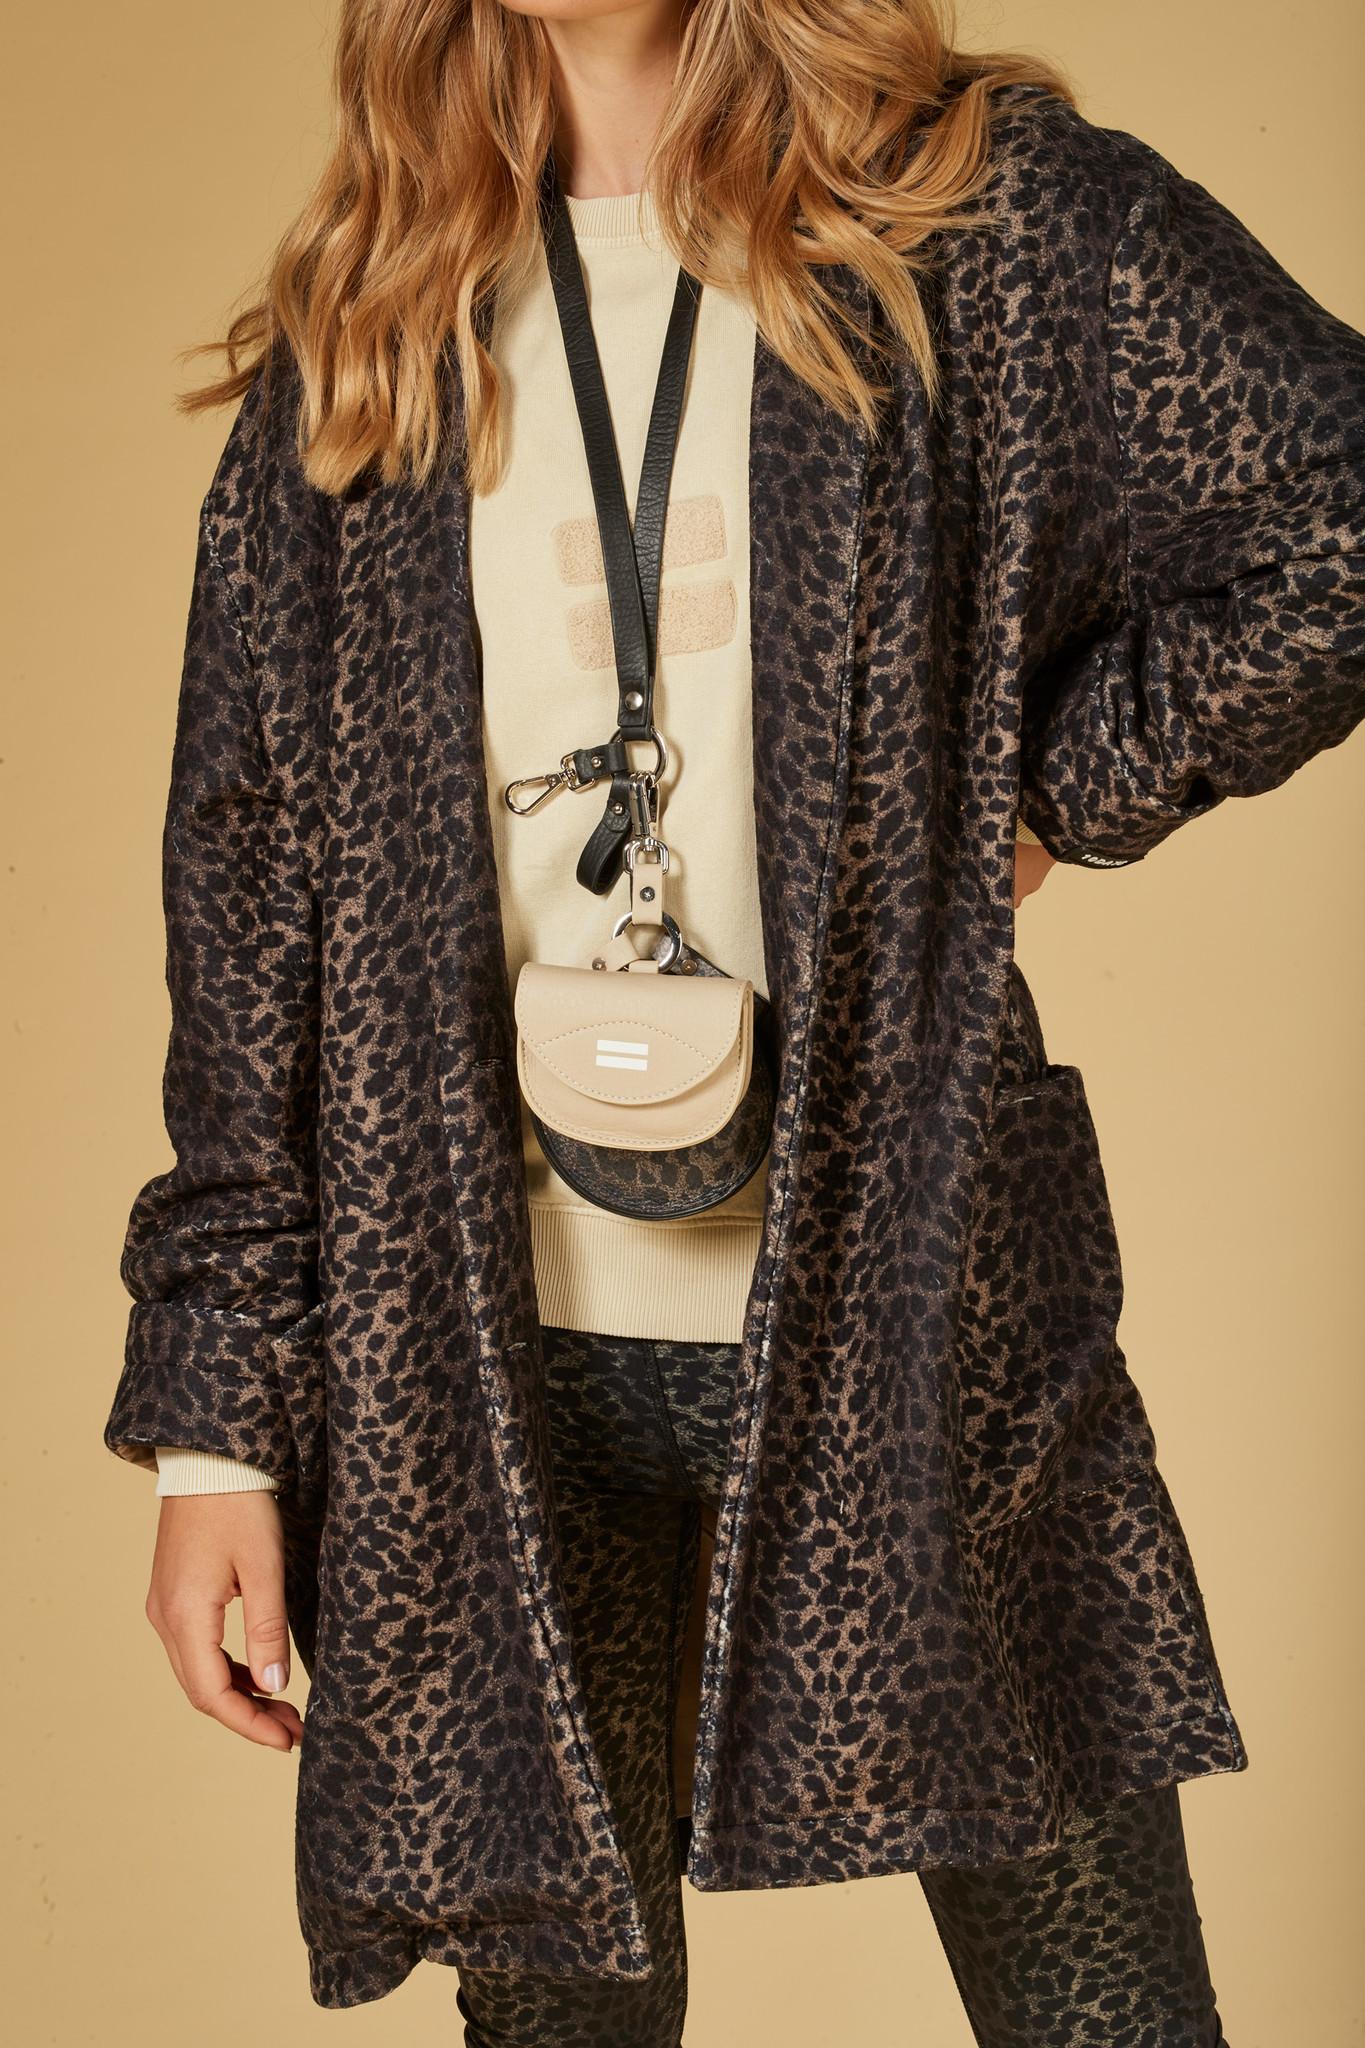 Tas keychain bag leopard camo desert taupe-5